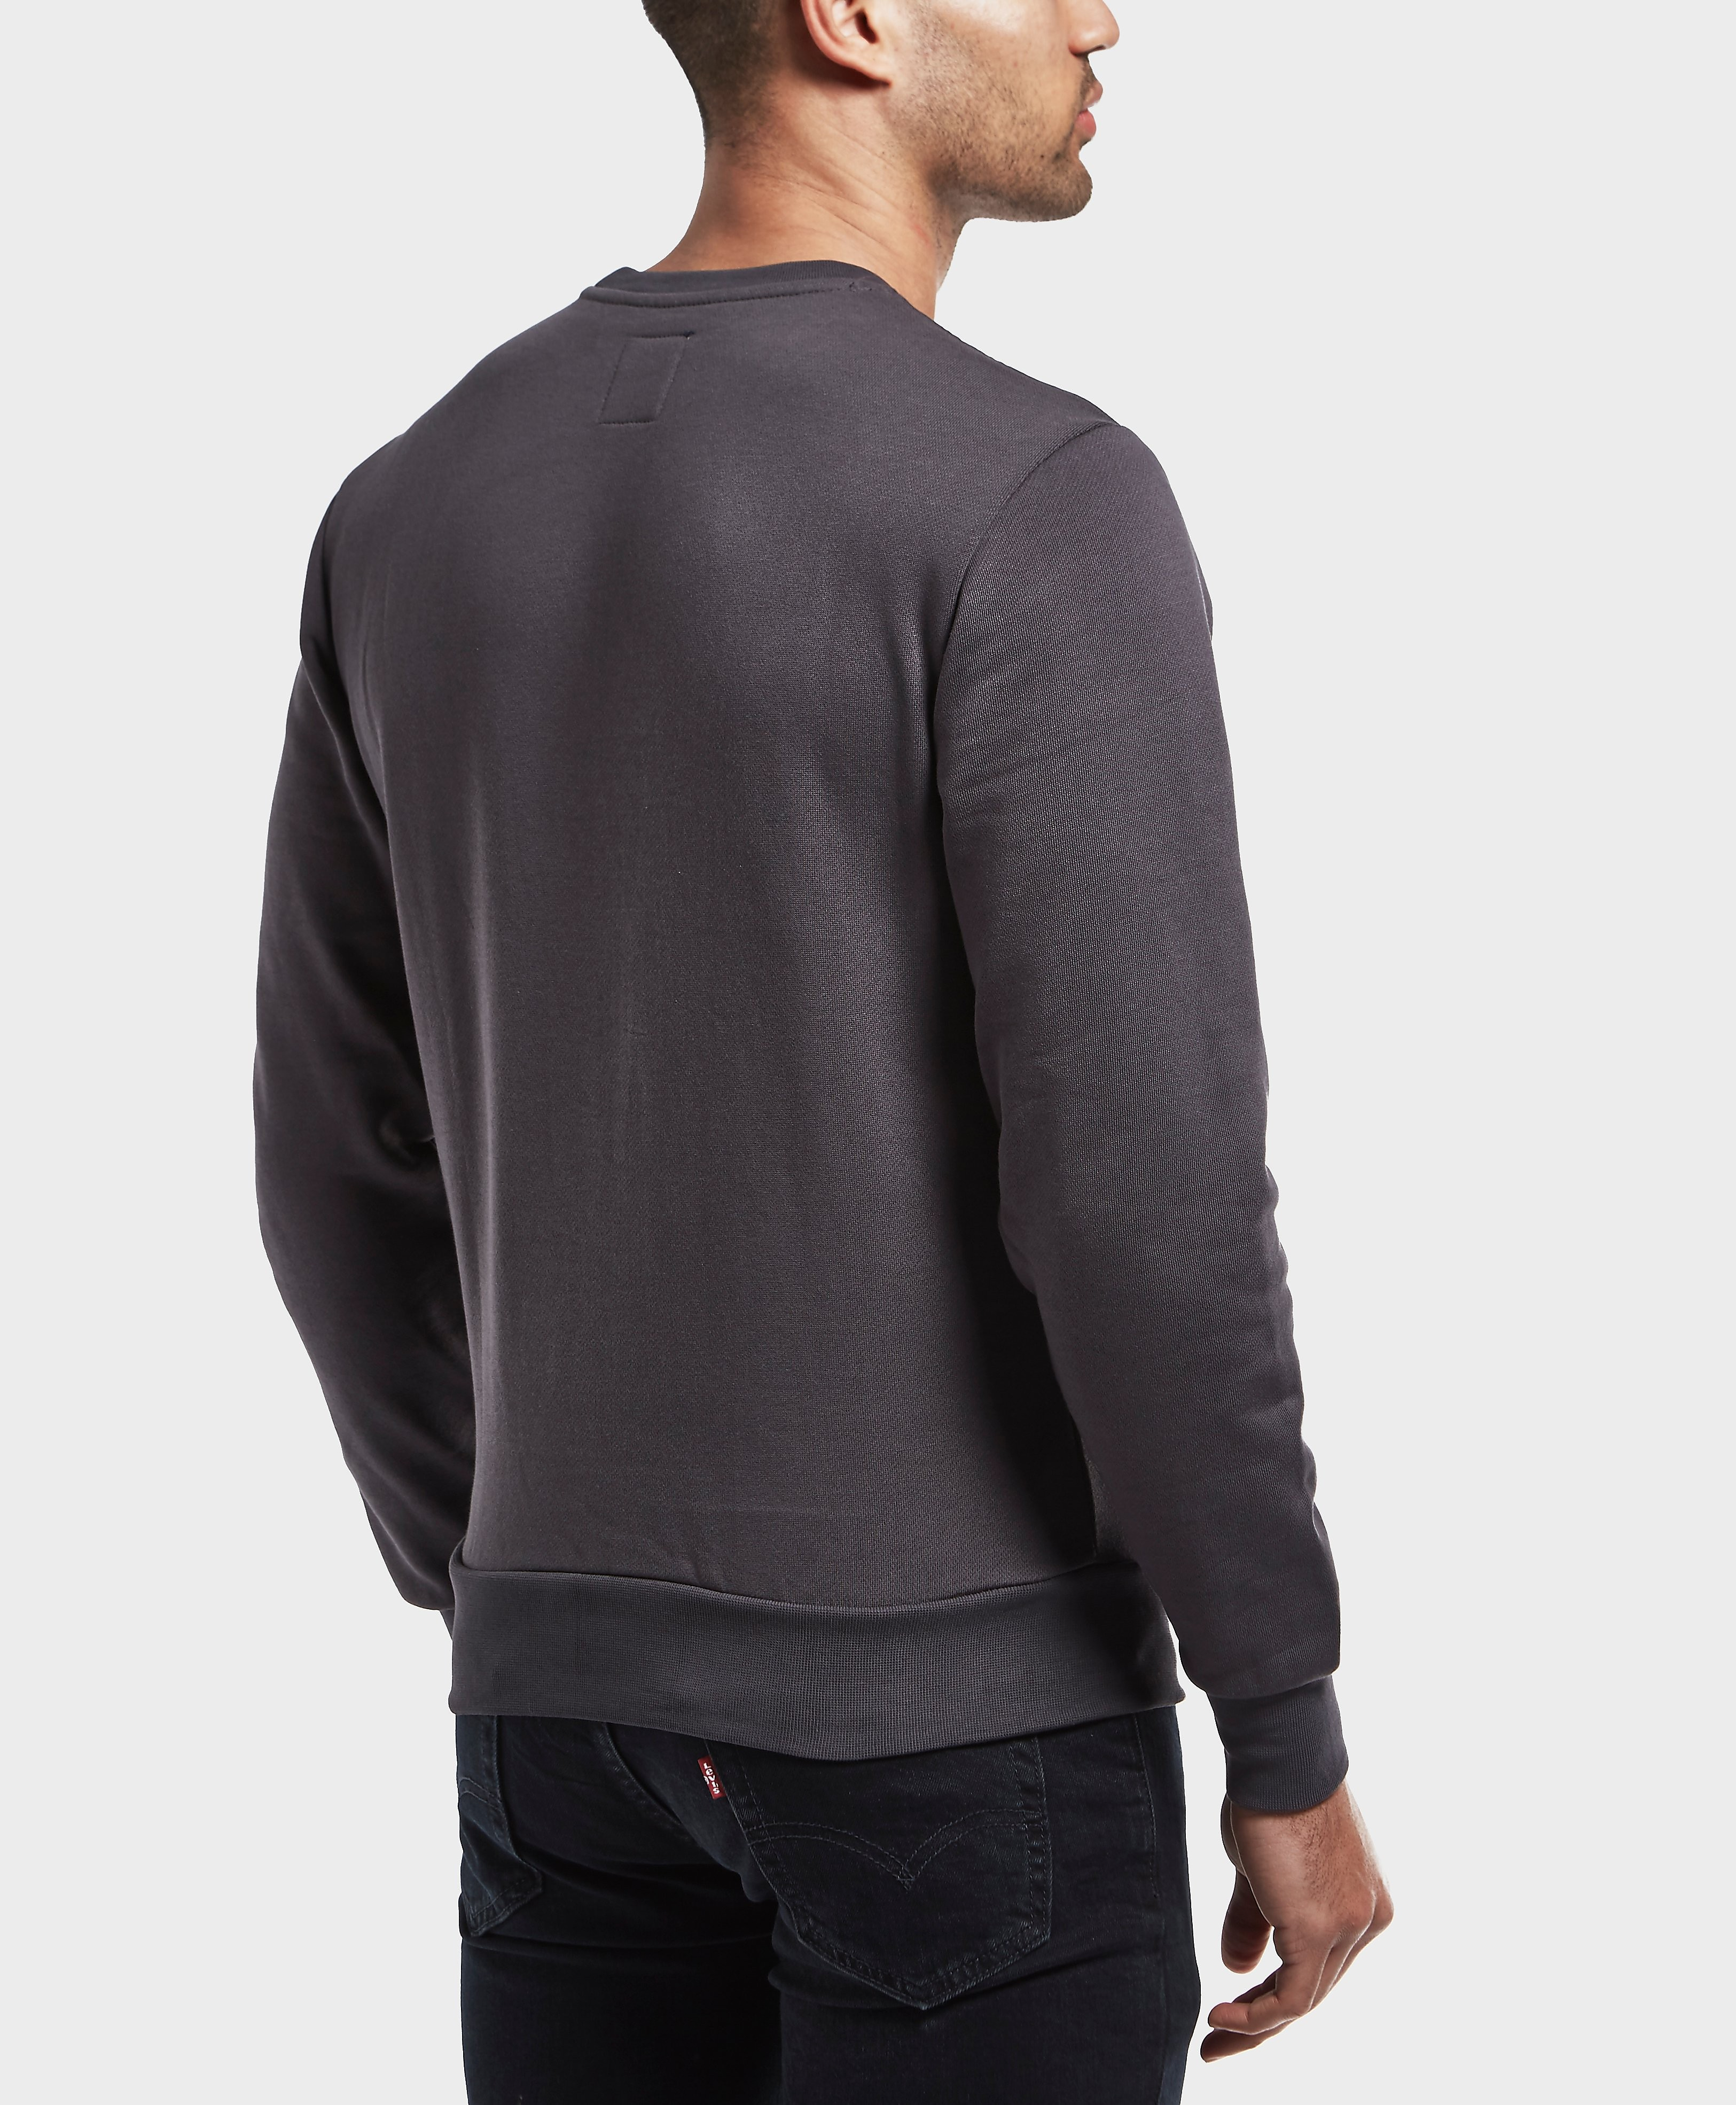 NORTH SAILS Reflective Logo Sweatshirt